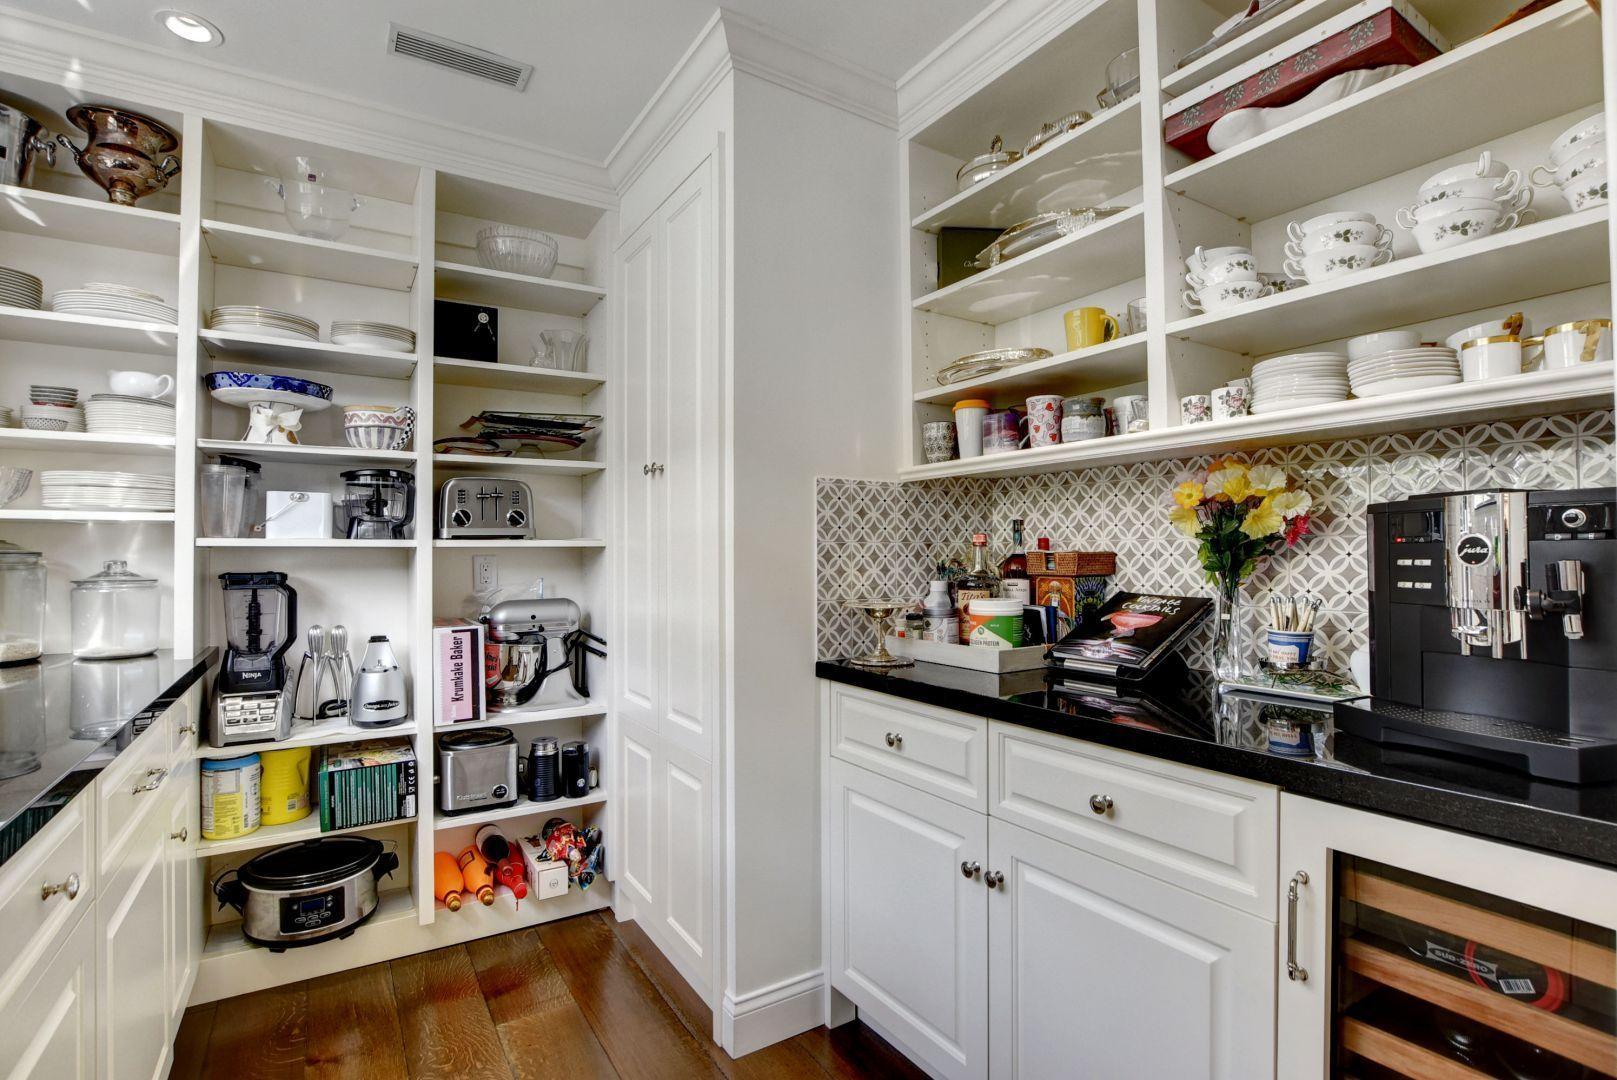 43_Butler's pantry